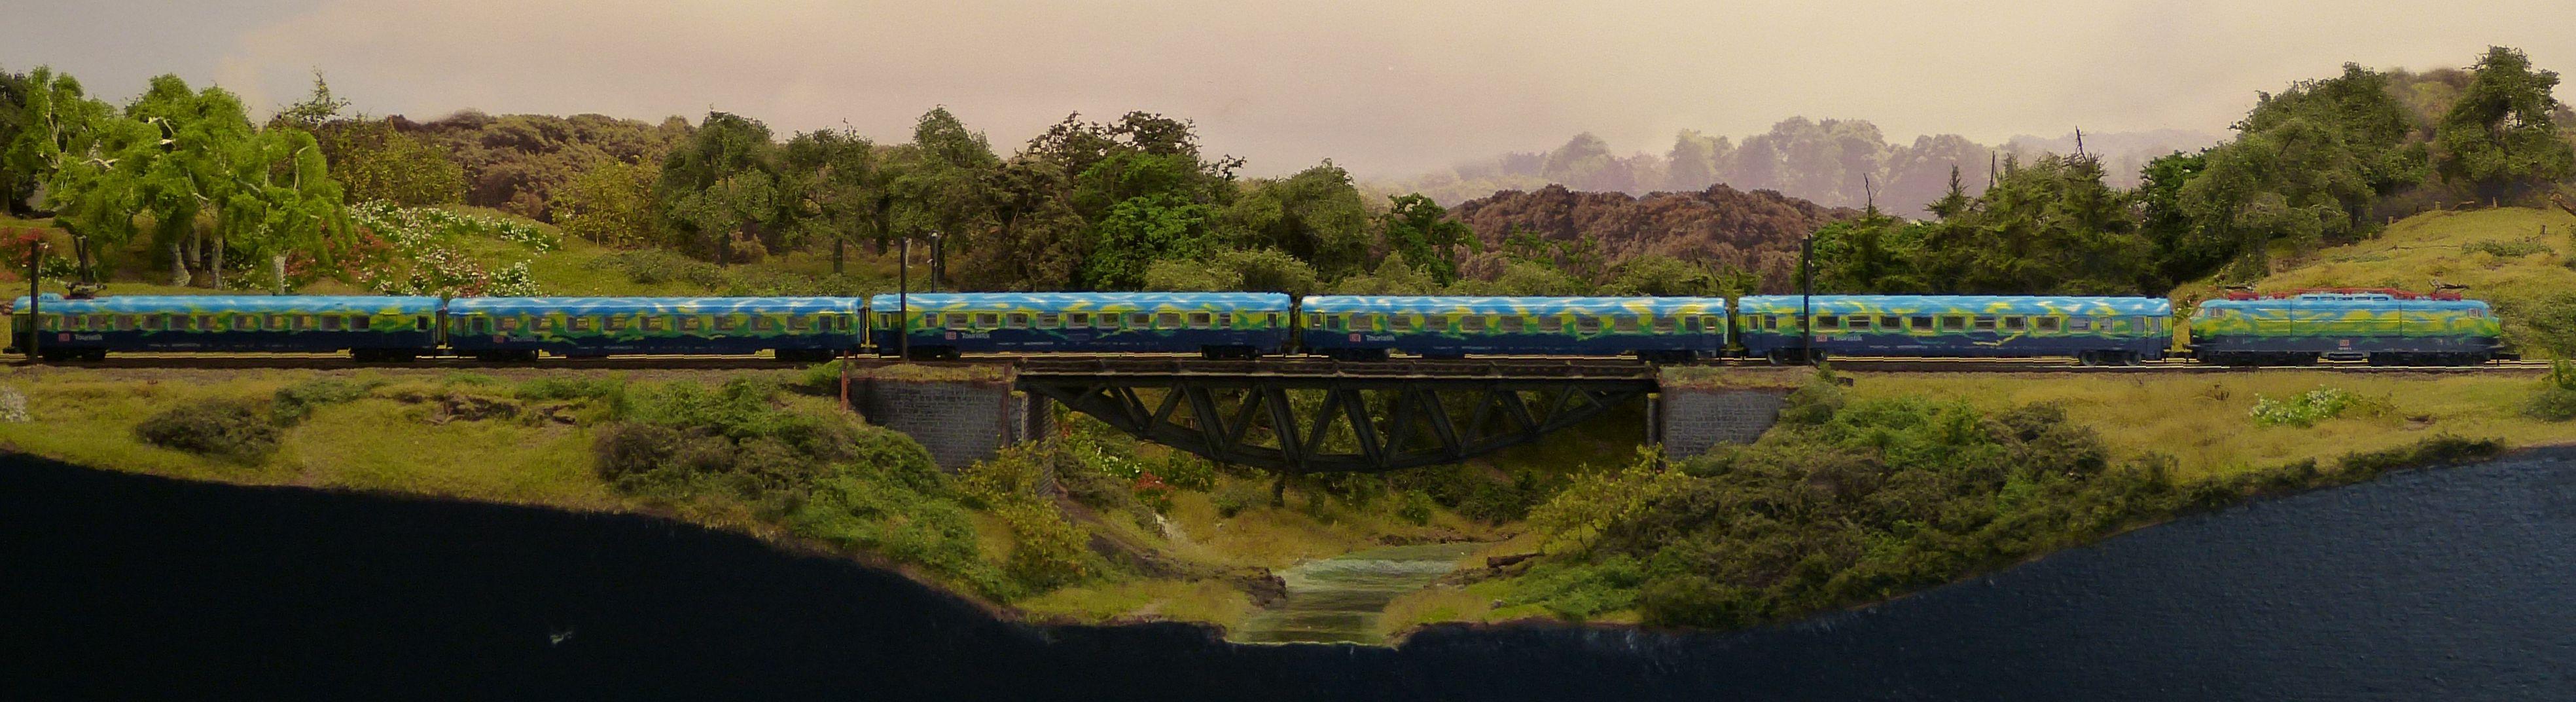 20-Touristik-Zug 1